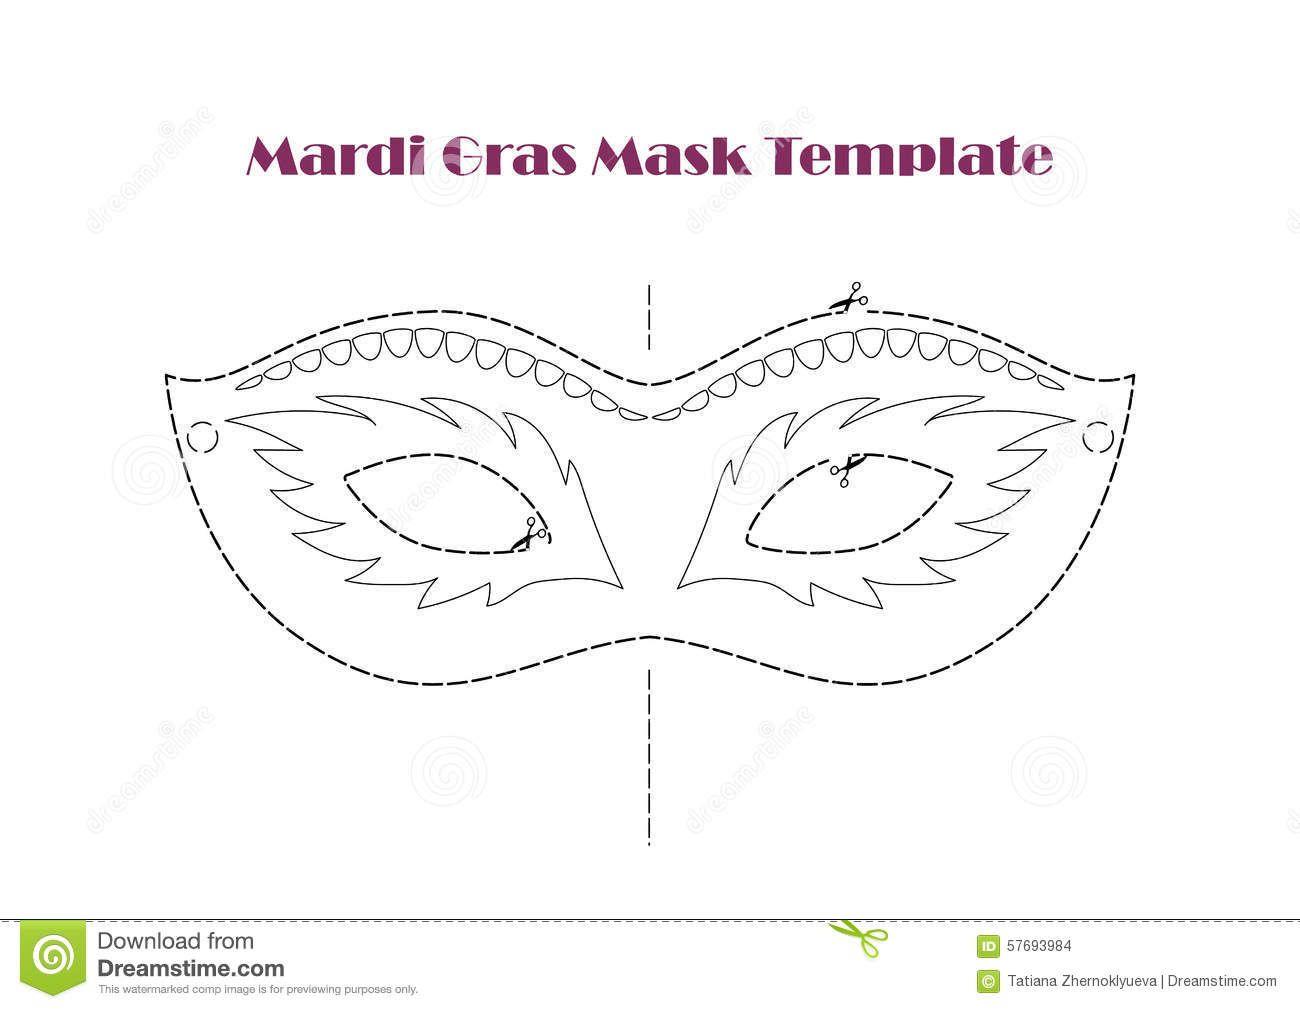 Maski Karnawalowe Szablony Szukaj W Google Mask Template Masquerade Mask Template Mardi Gras Mask Template